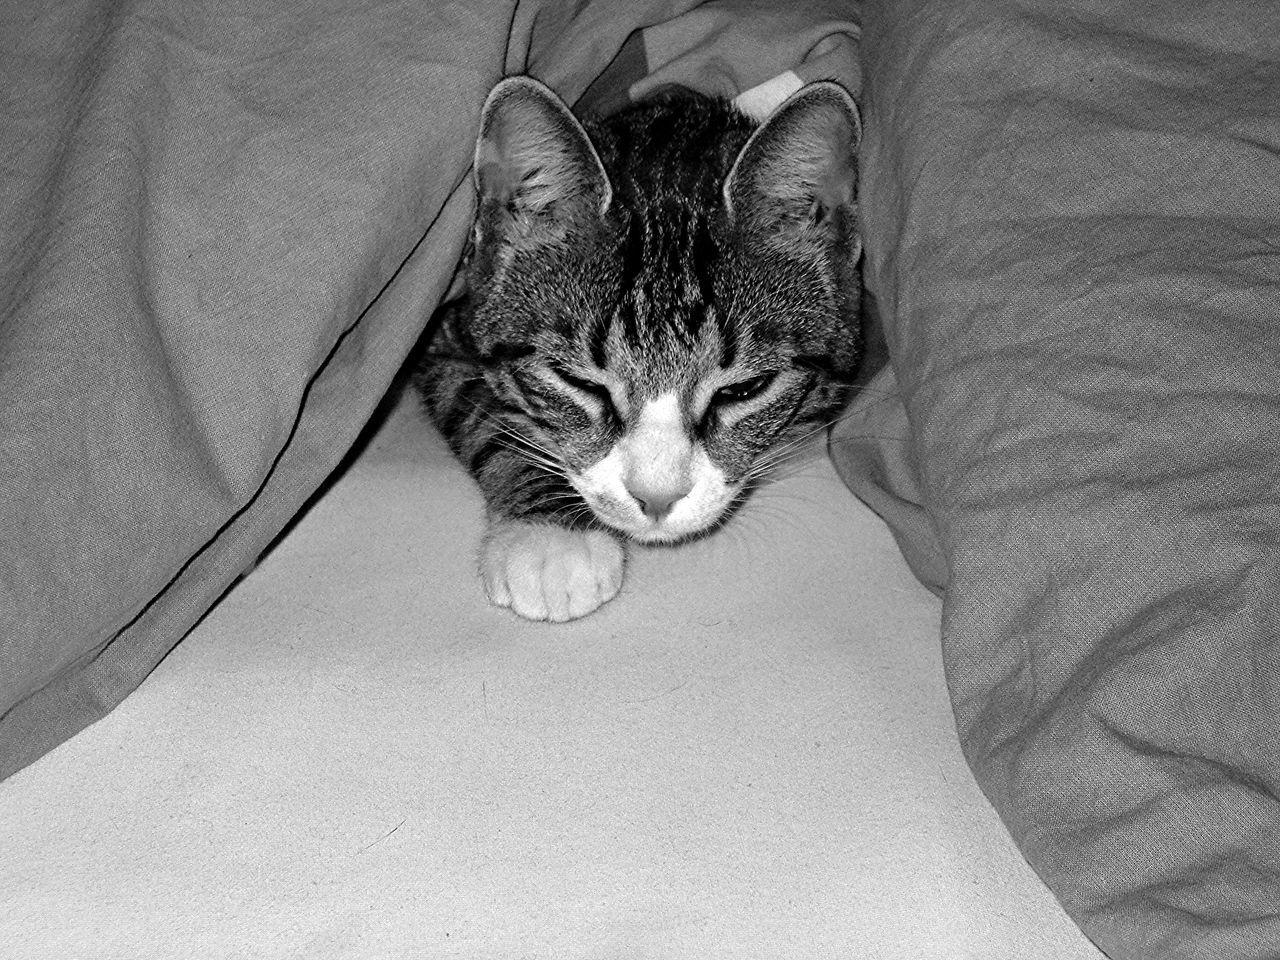 Babycats Cat Catlady Catlovers Cutecat Kittens Kitty Cat Smallcat Tiredcat